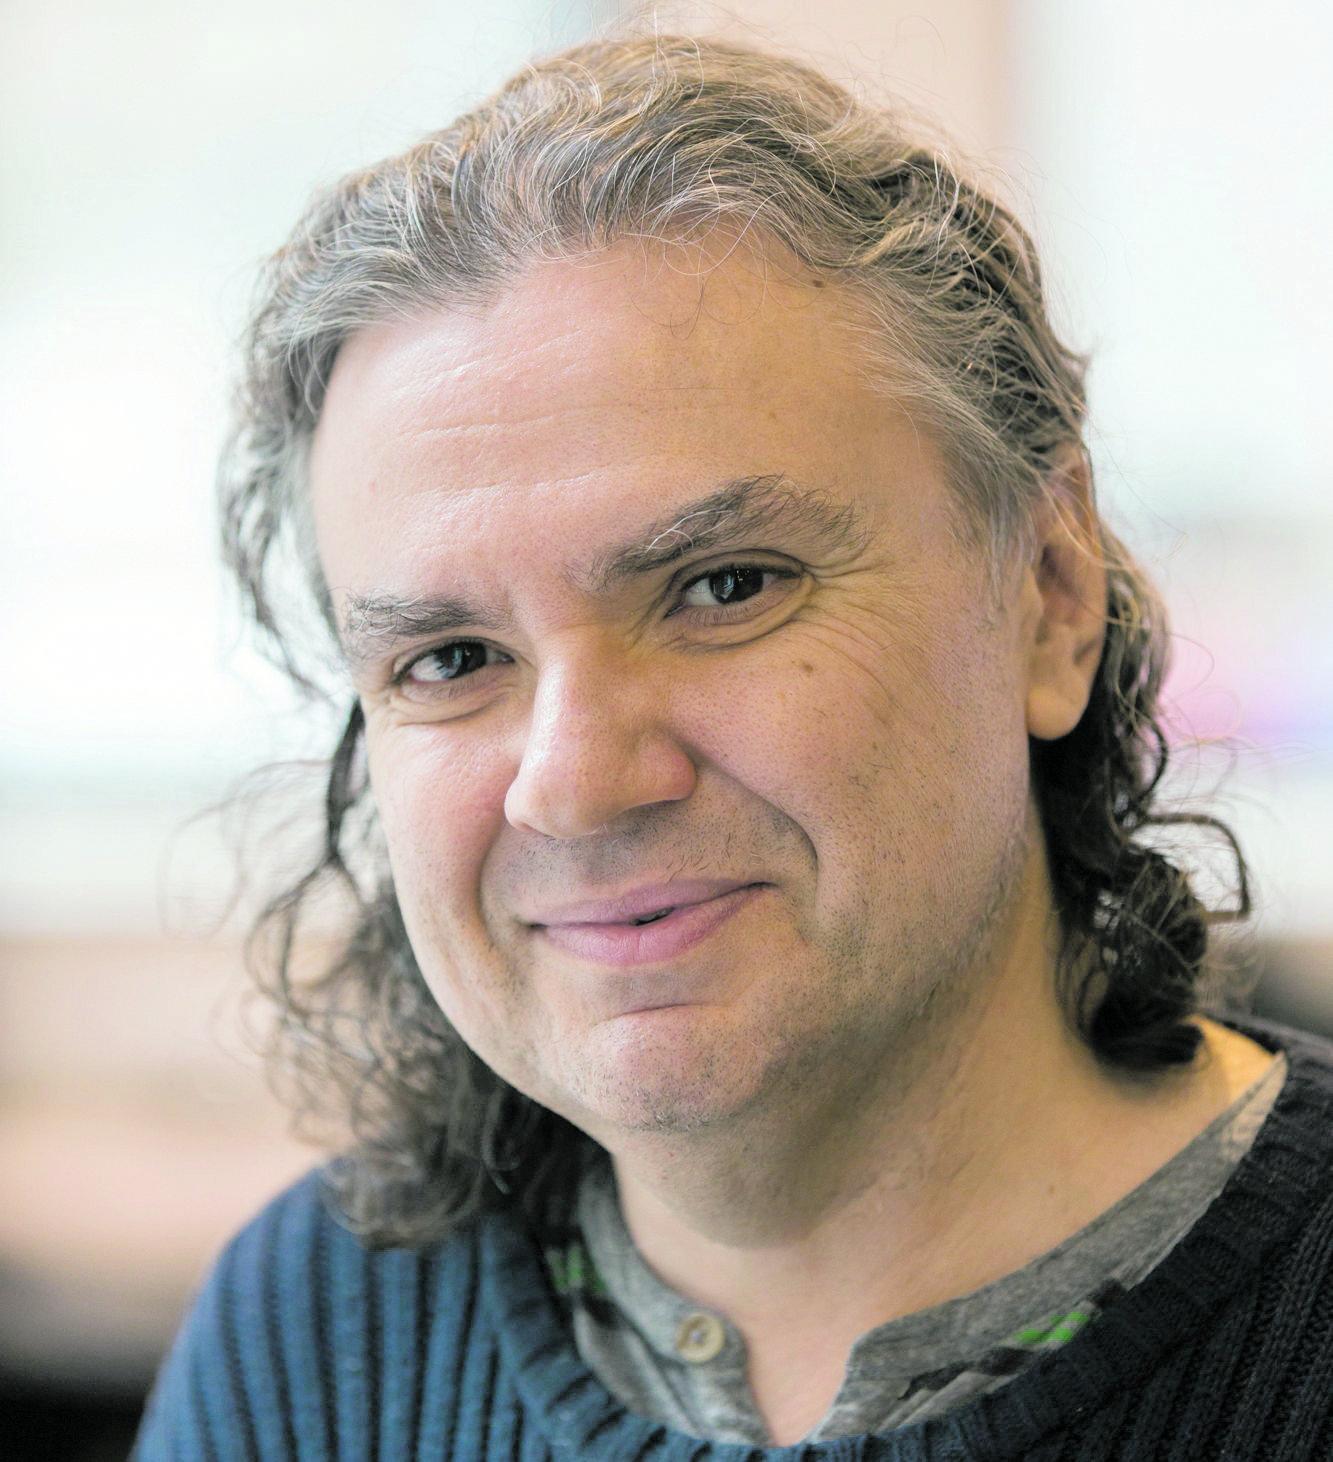 Александр Эскин. Фото с сайта simonsfoundation.org